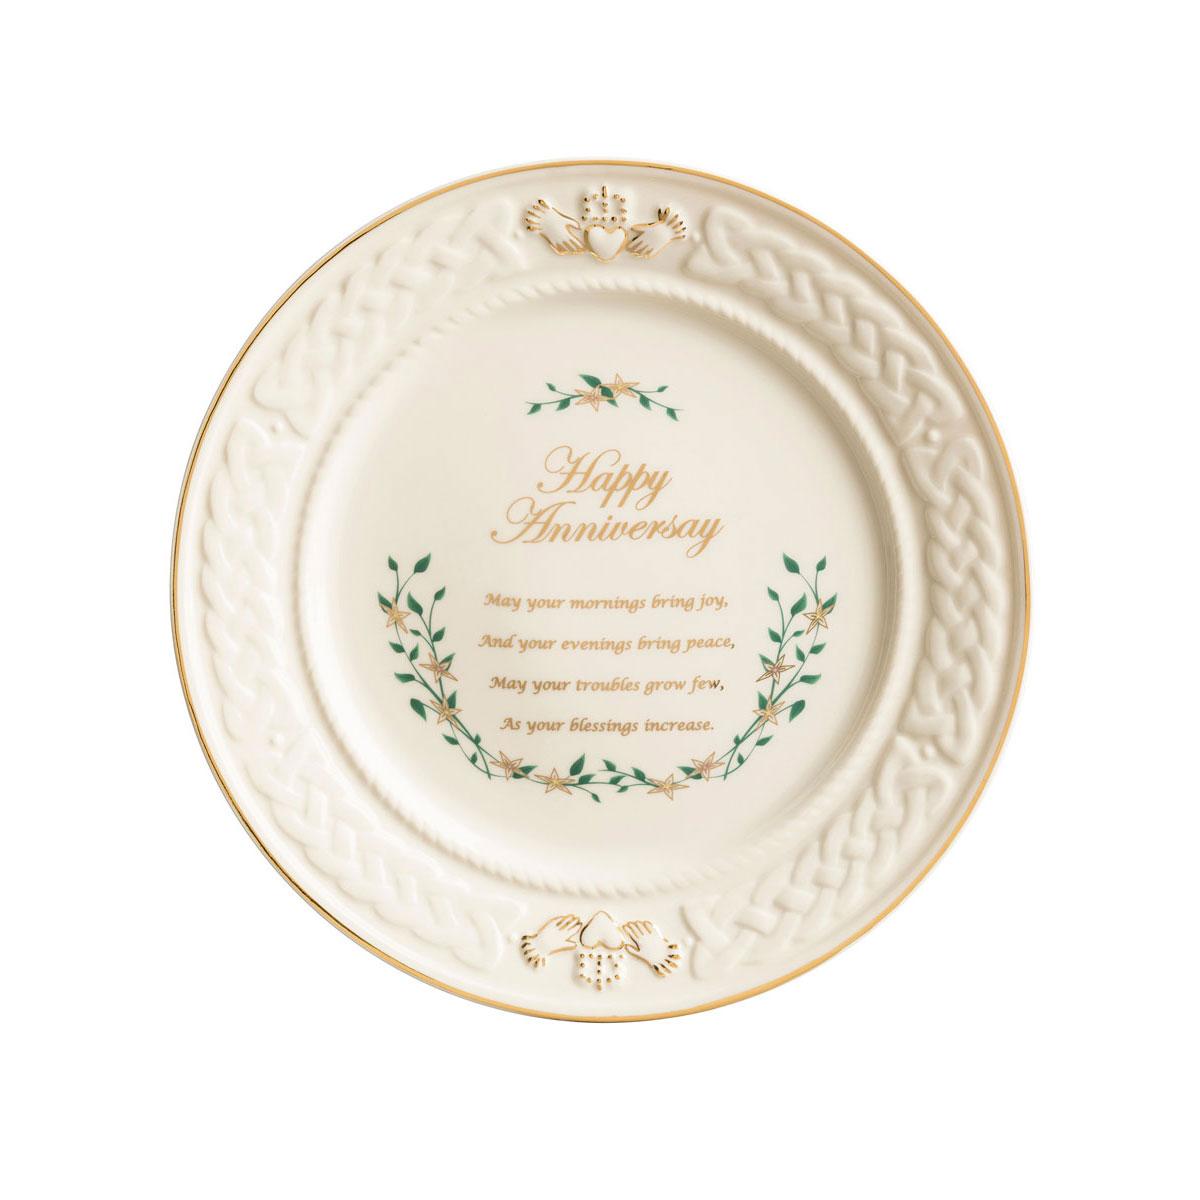 Belleek China Celebration Happy Anniversary Plate